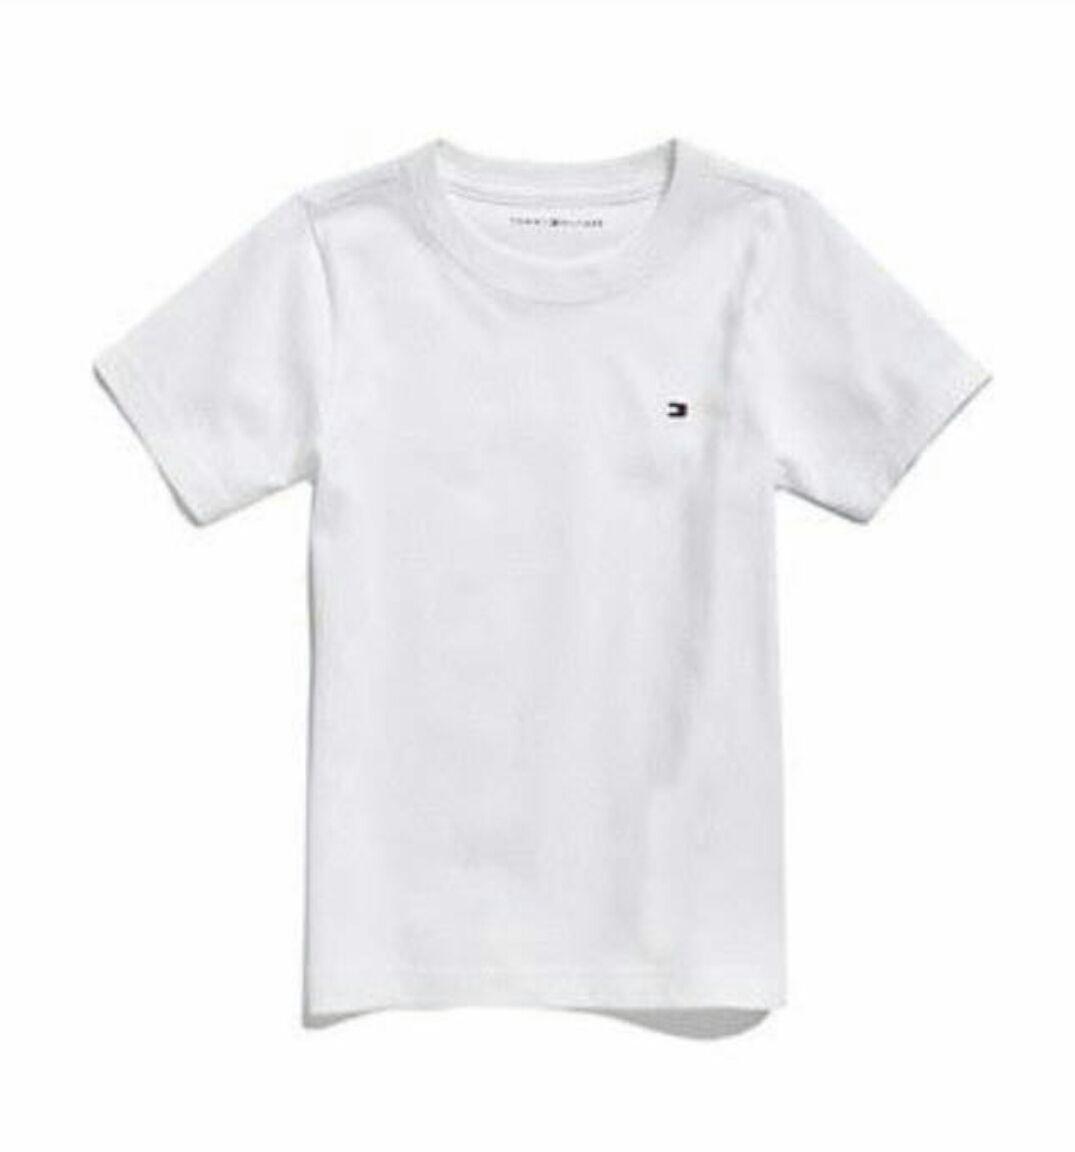 Camiseta Branca - Tommy Hilfiger®